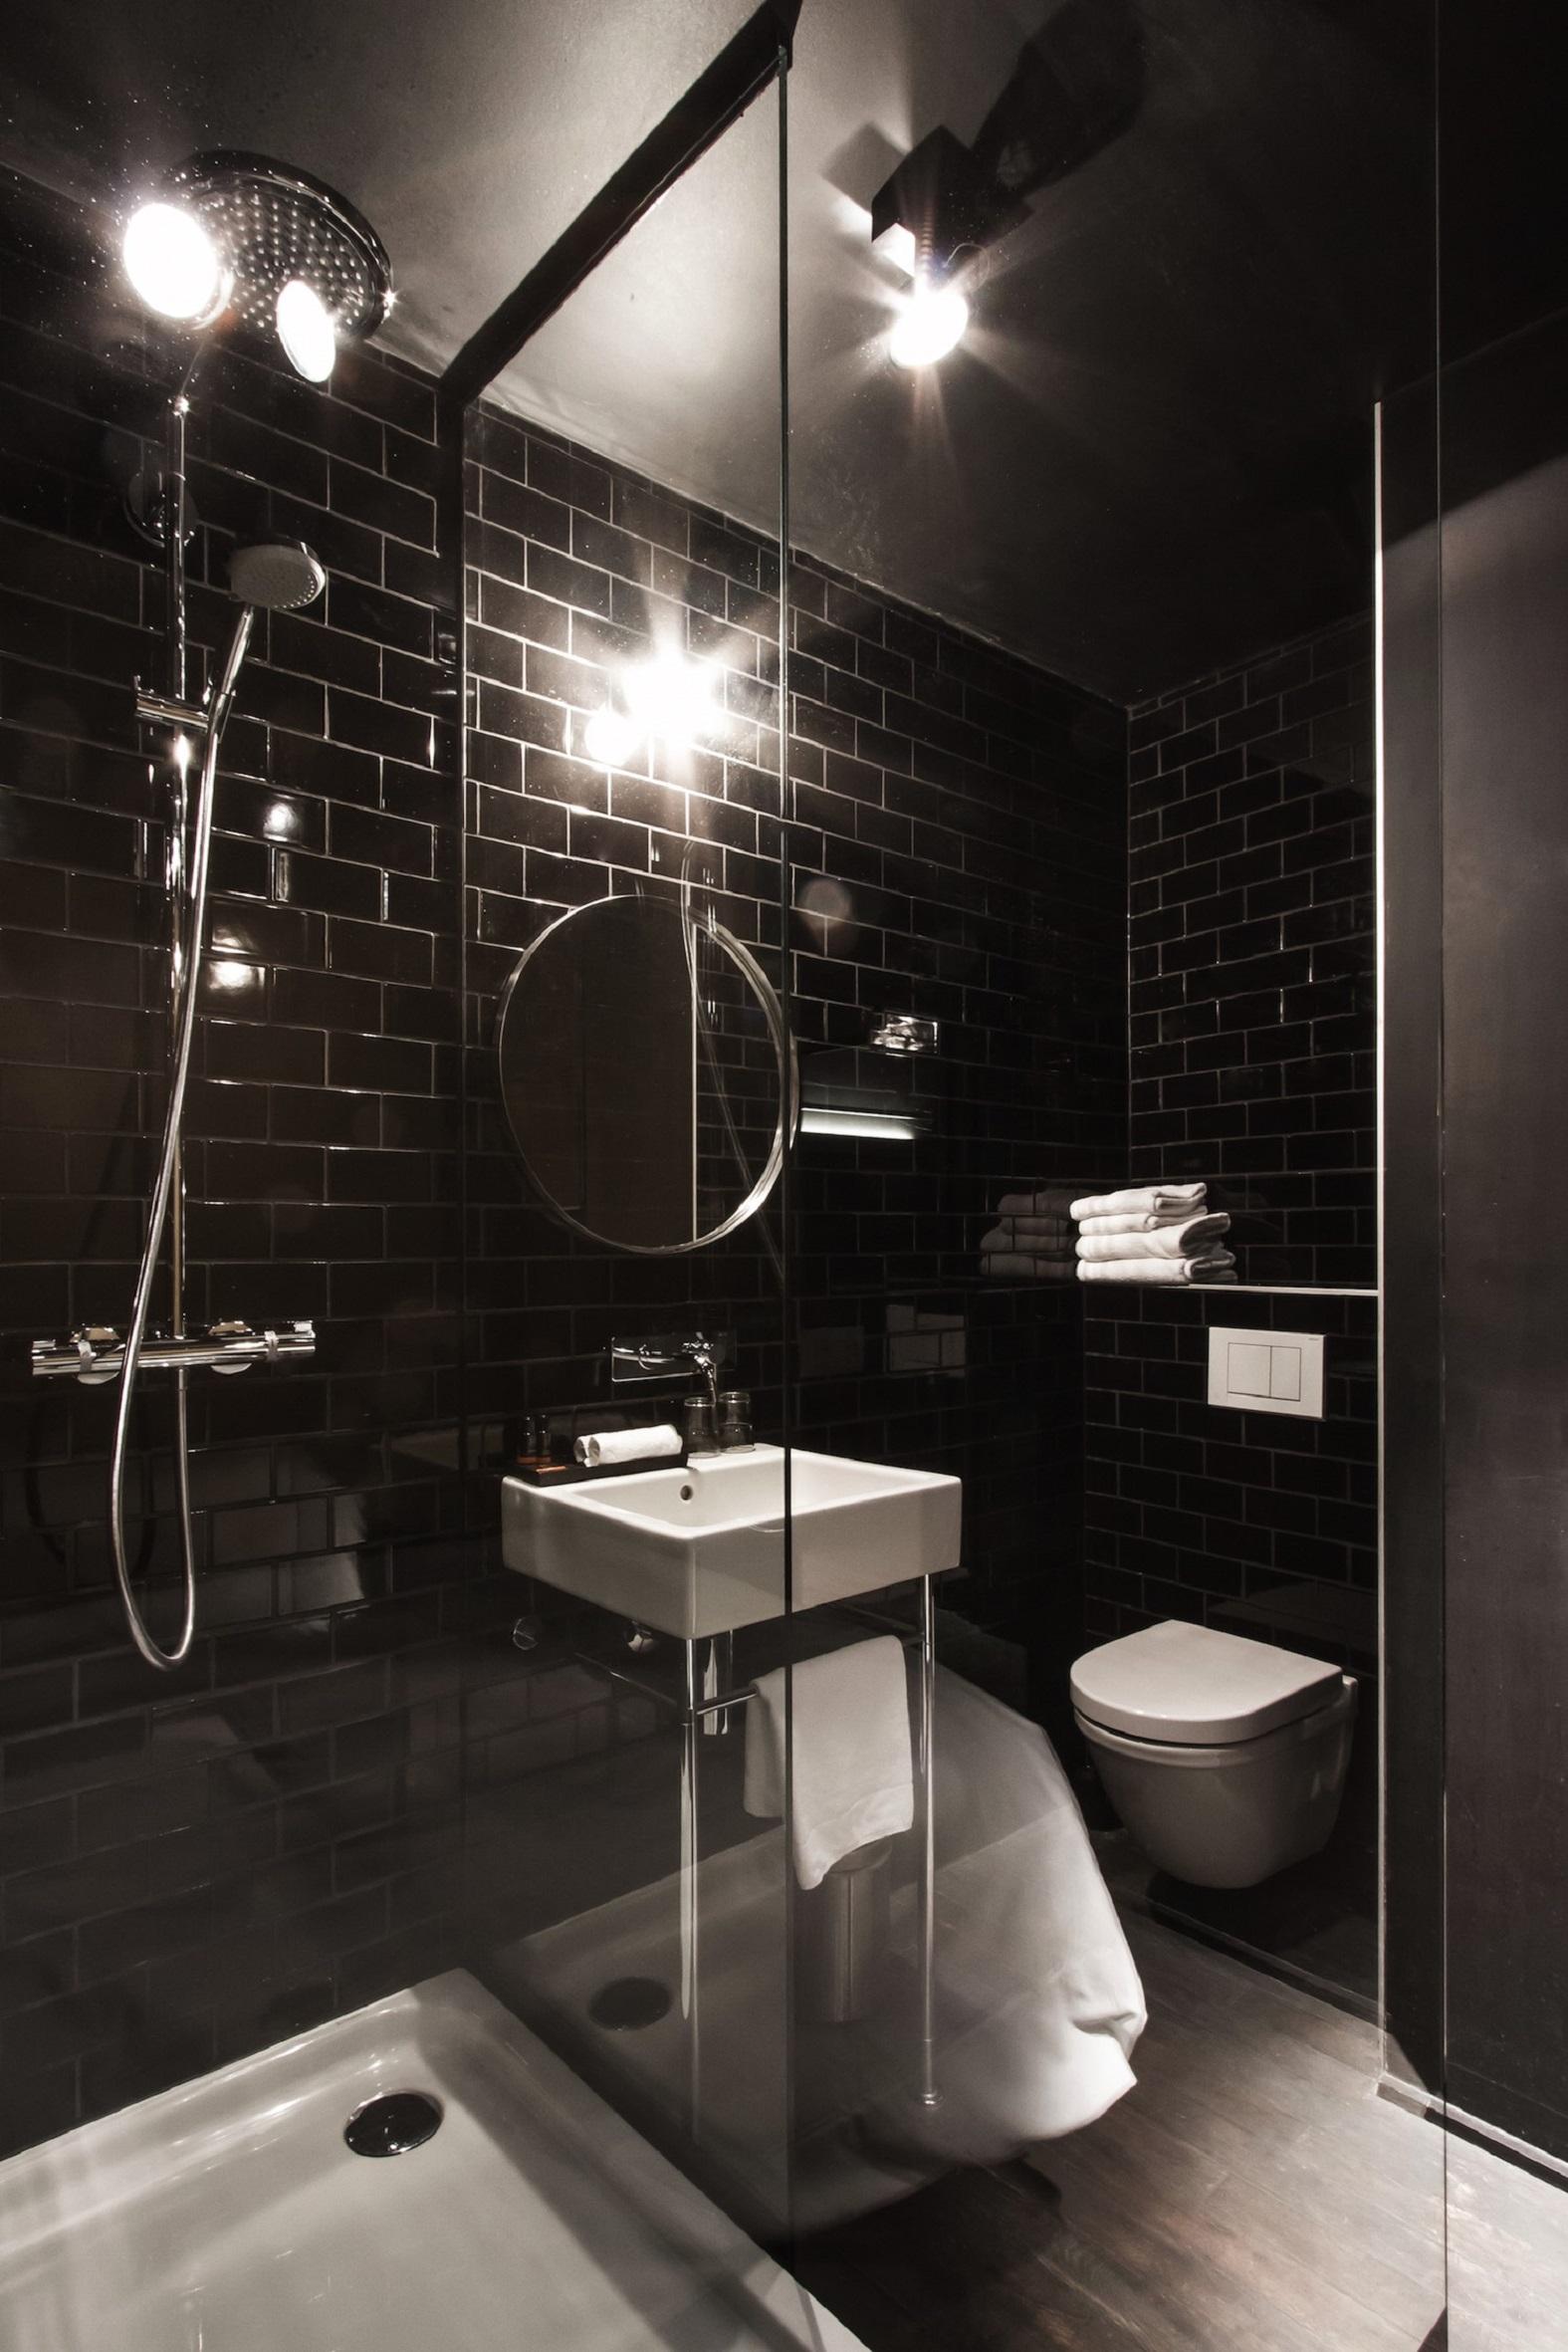 Excellent Pictures Of Comfort Room Design Images Best Ideas